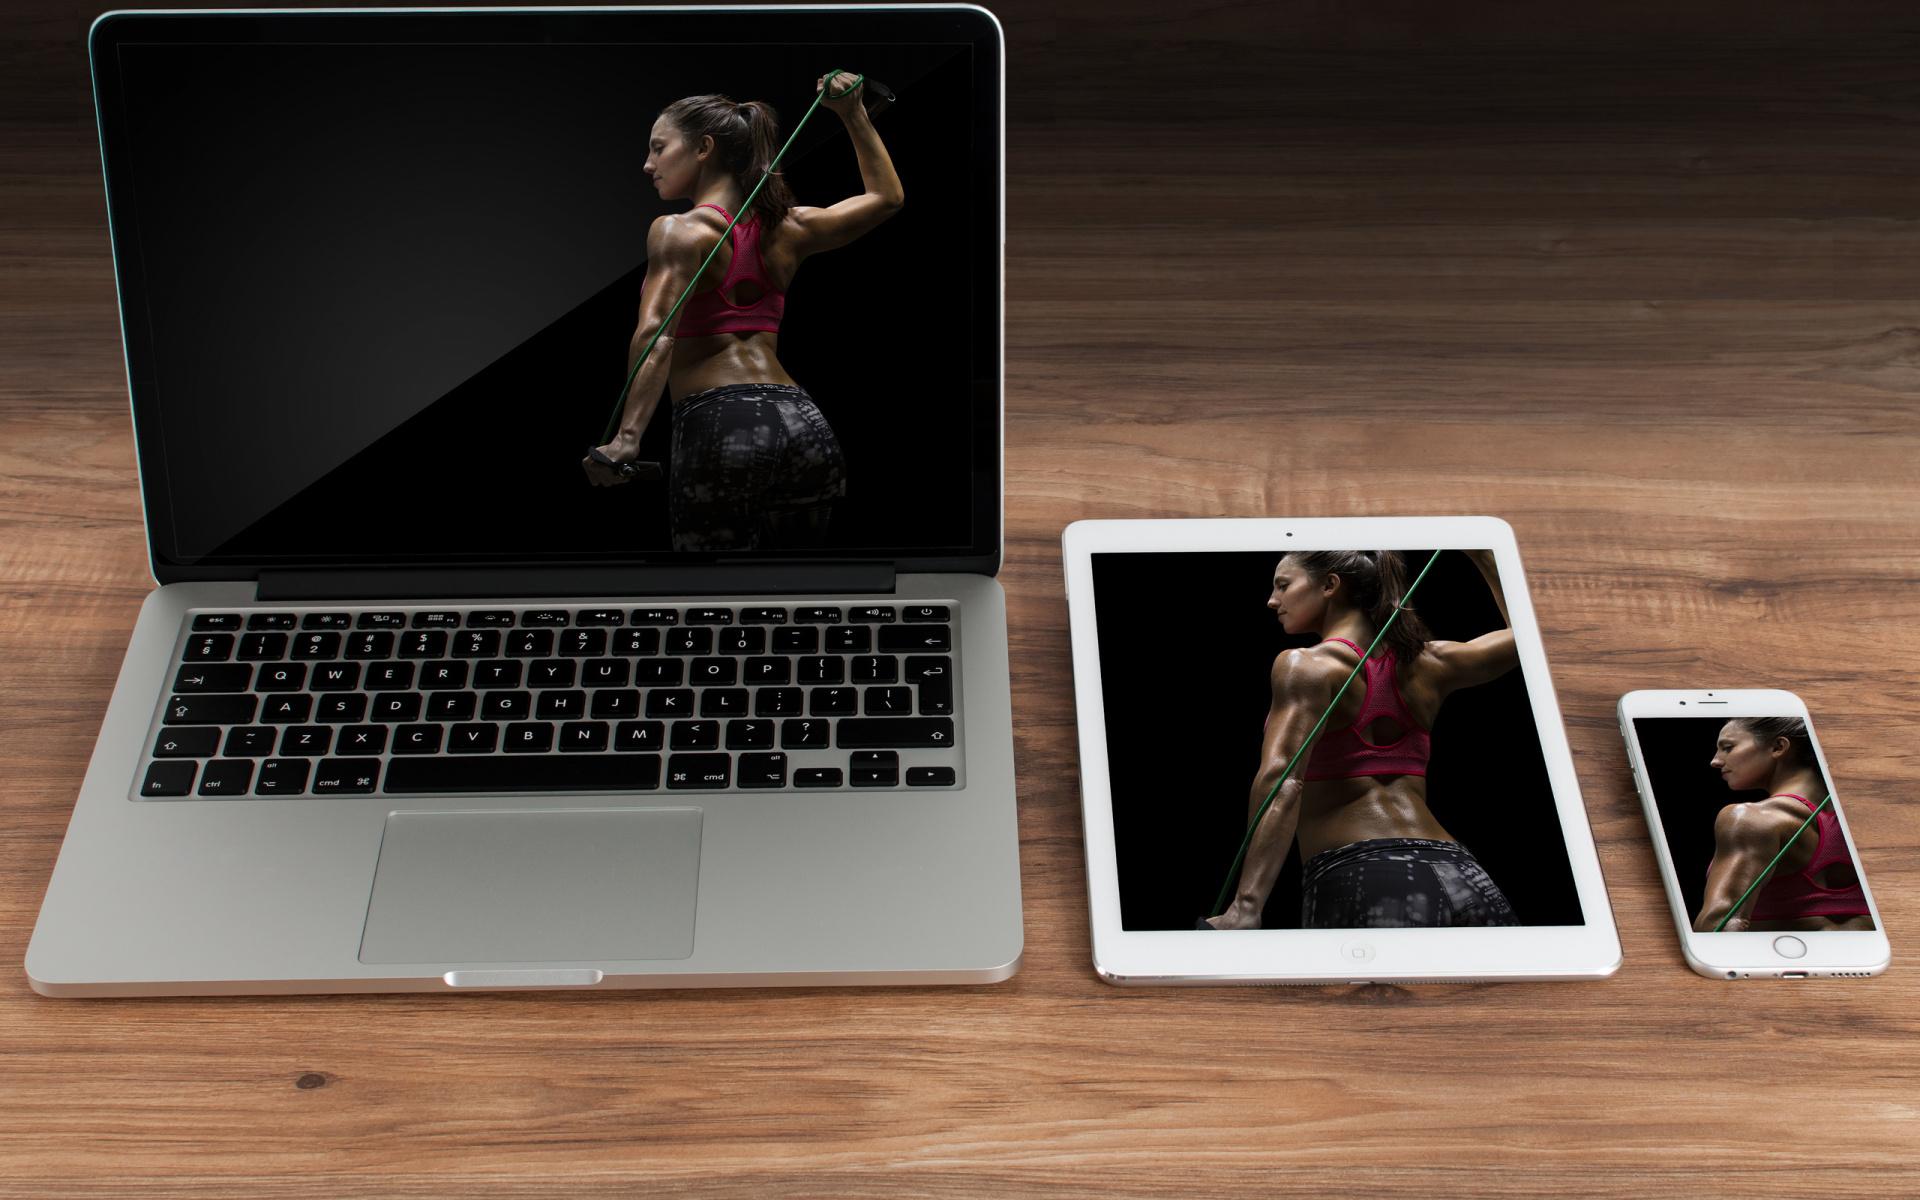 Ios, Brand, Macbook Pro, Macbook Air, Imac Pro Wallpaper - Macbook Pro , HD Wallpaper & Backgrounds